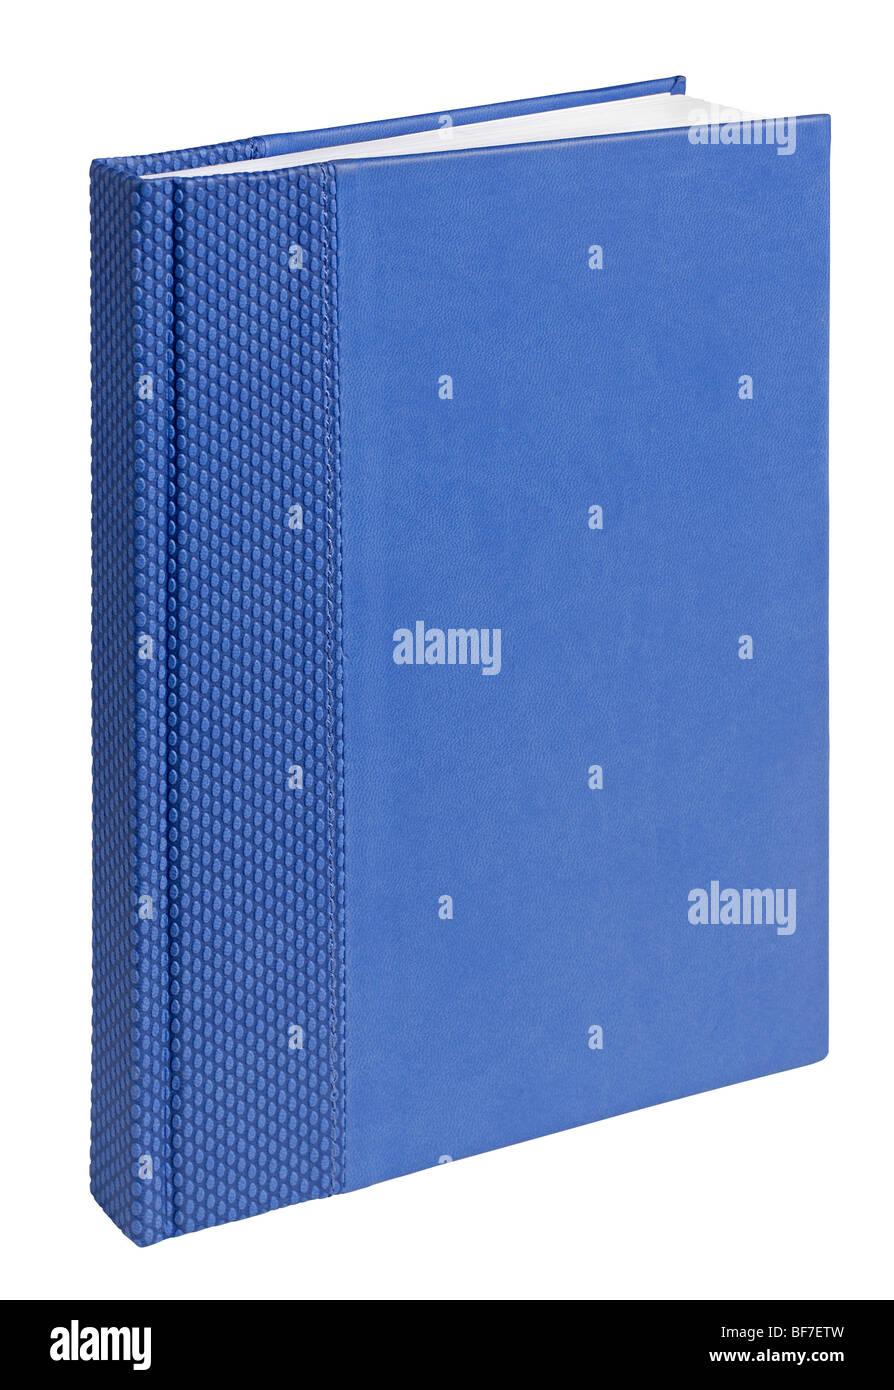 Revue De Livre Bleu Livre Croquis Dessiner Banque D Images